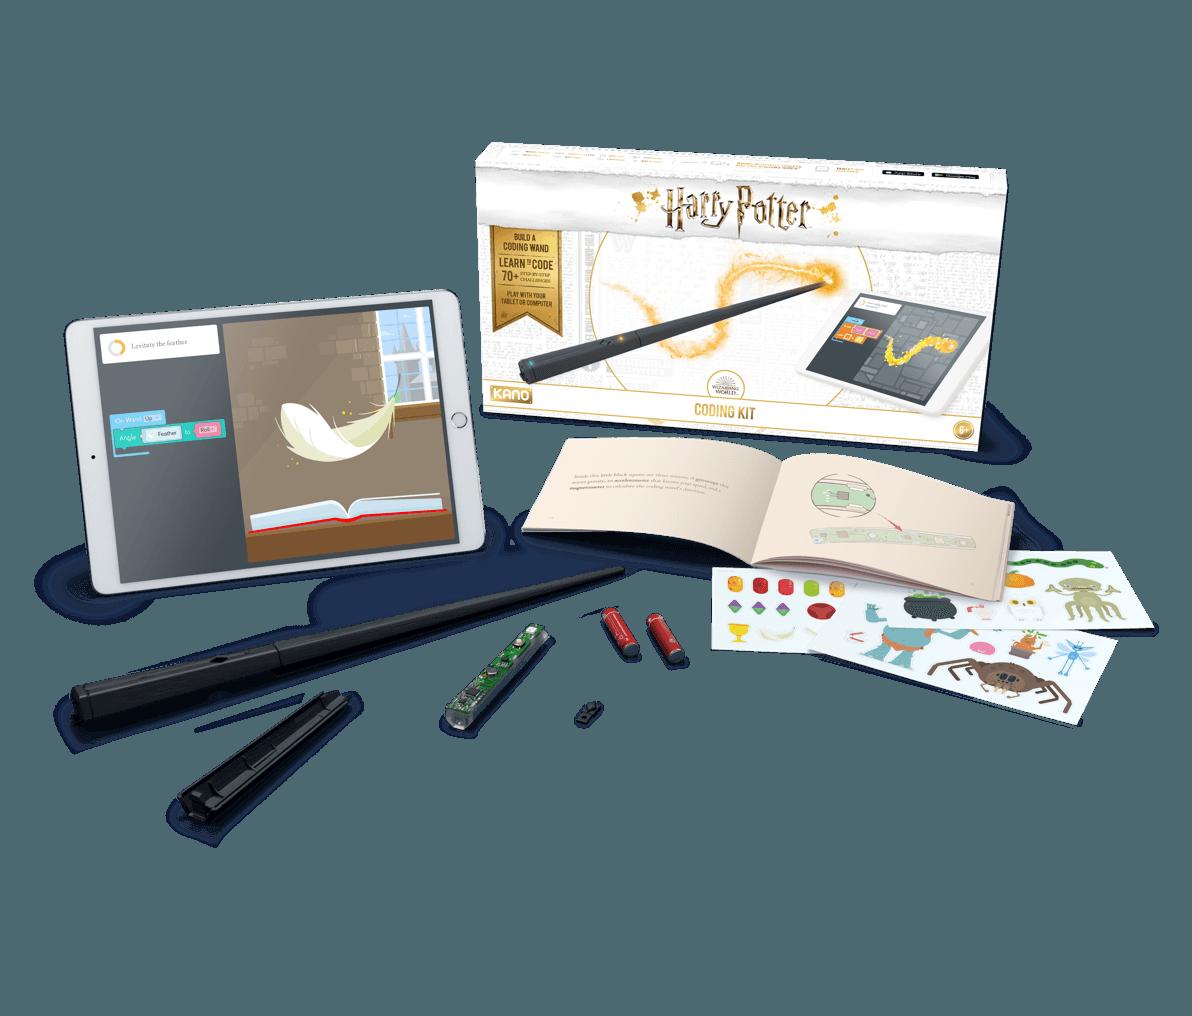 shop-page-kano-coding-kit-2x.png